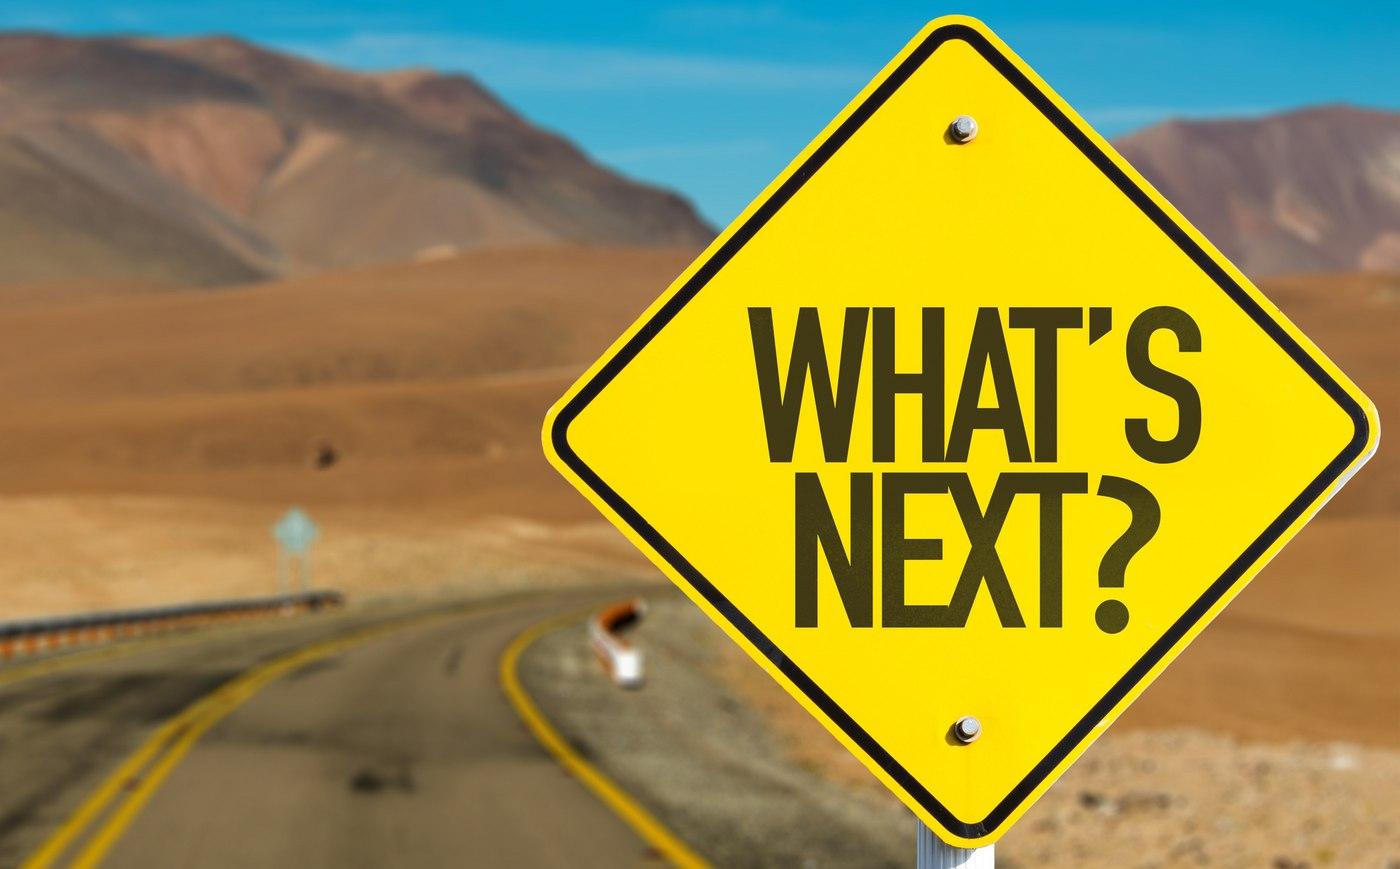 What's Next? Google Next!